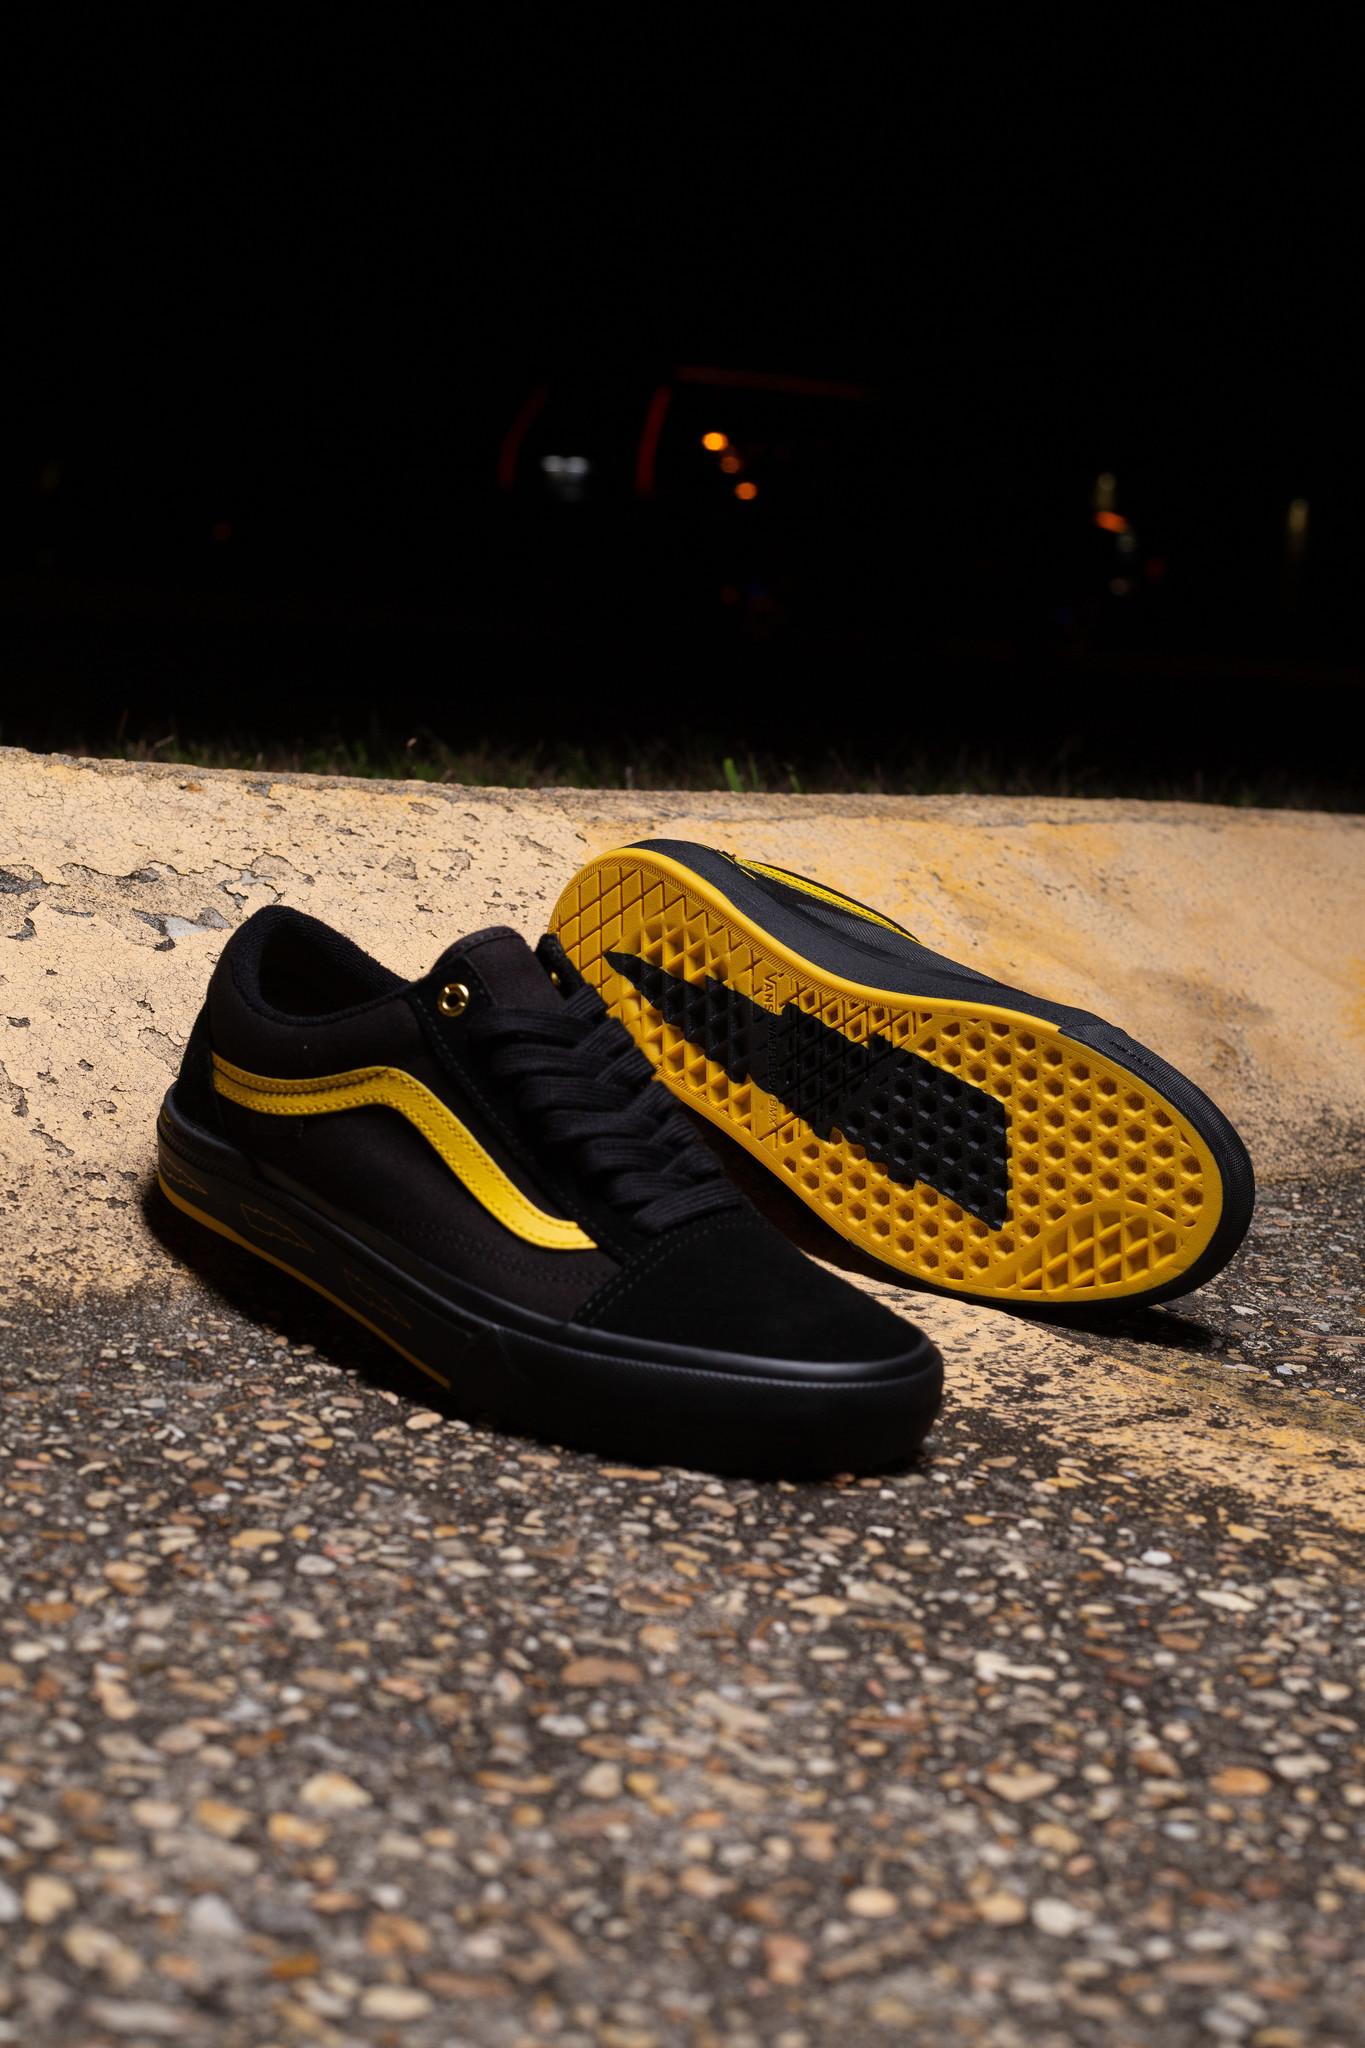 Vans x Larry Edgar Old Skool Pro BMX Black/Yellow